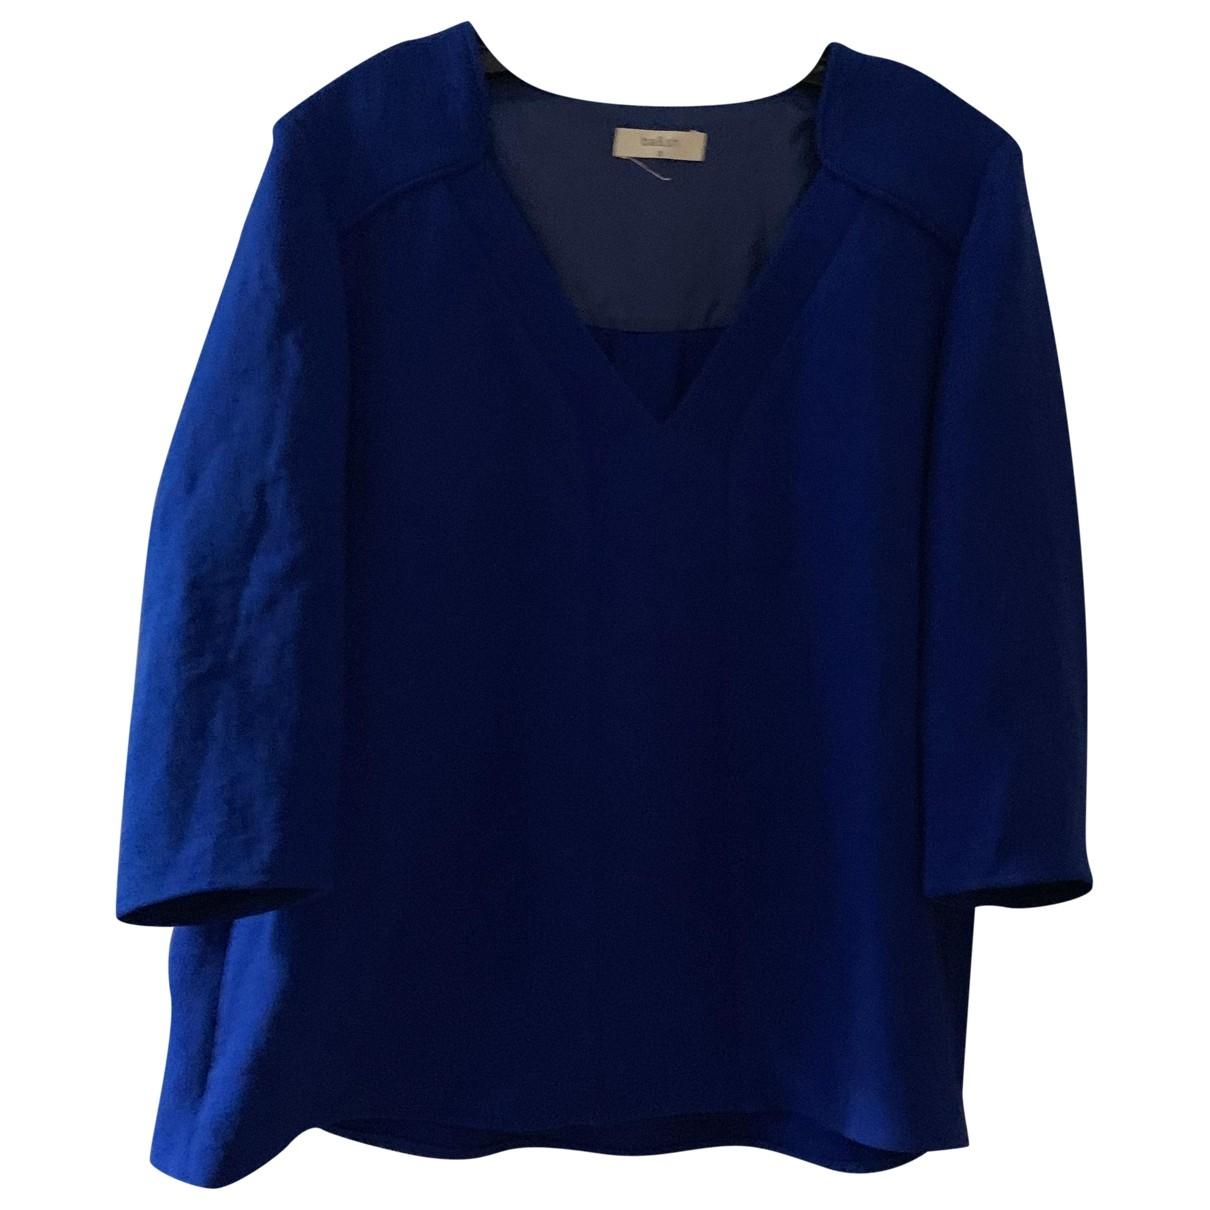 Ba&sh \N Blue  top for Women 38 FR